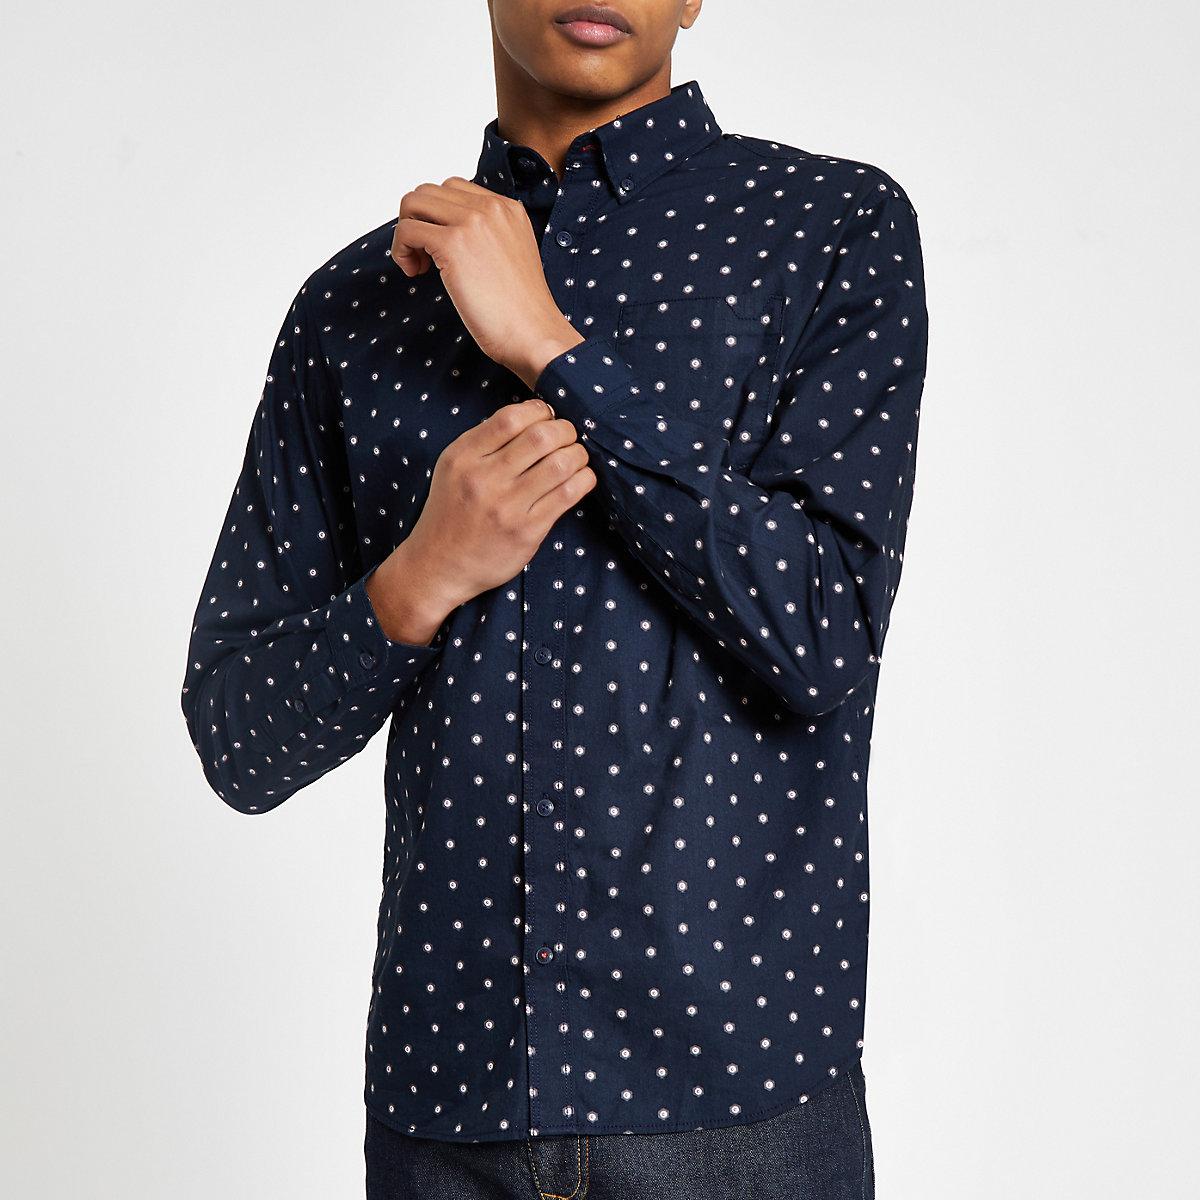 Jack & Jones navy spot shirt